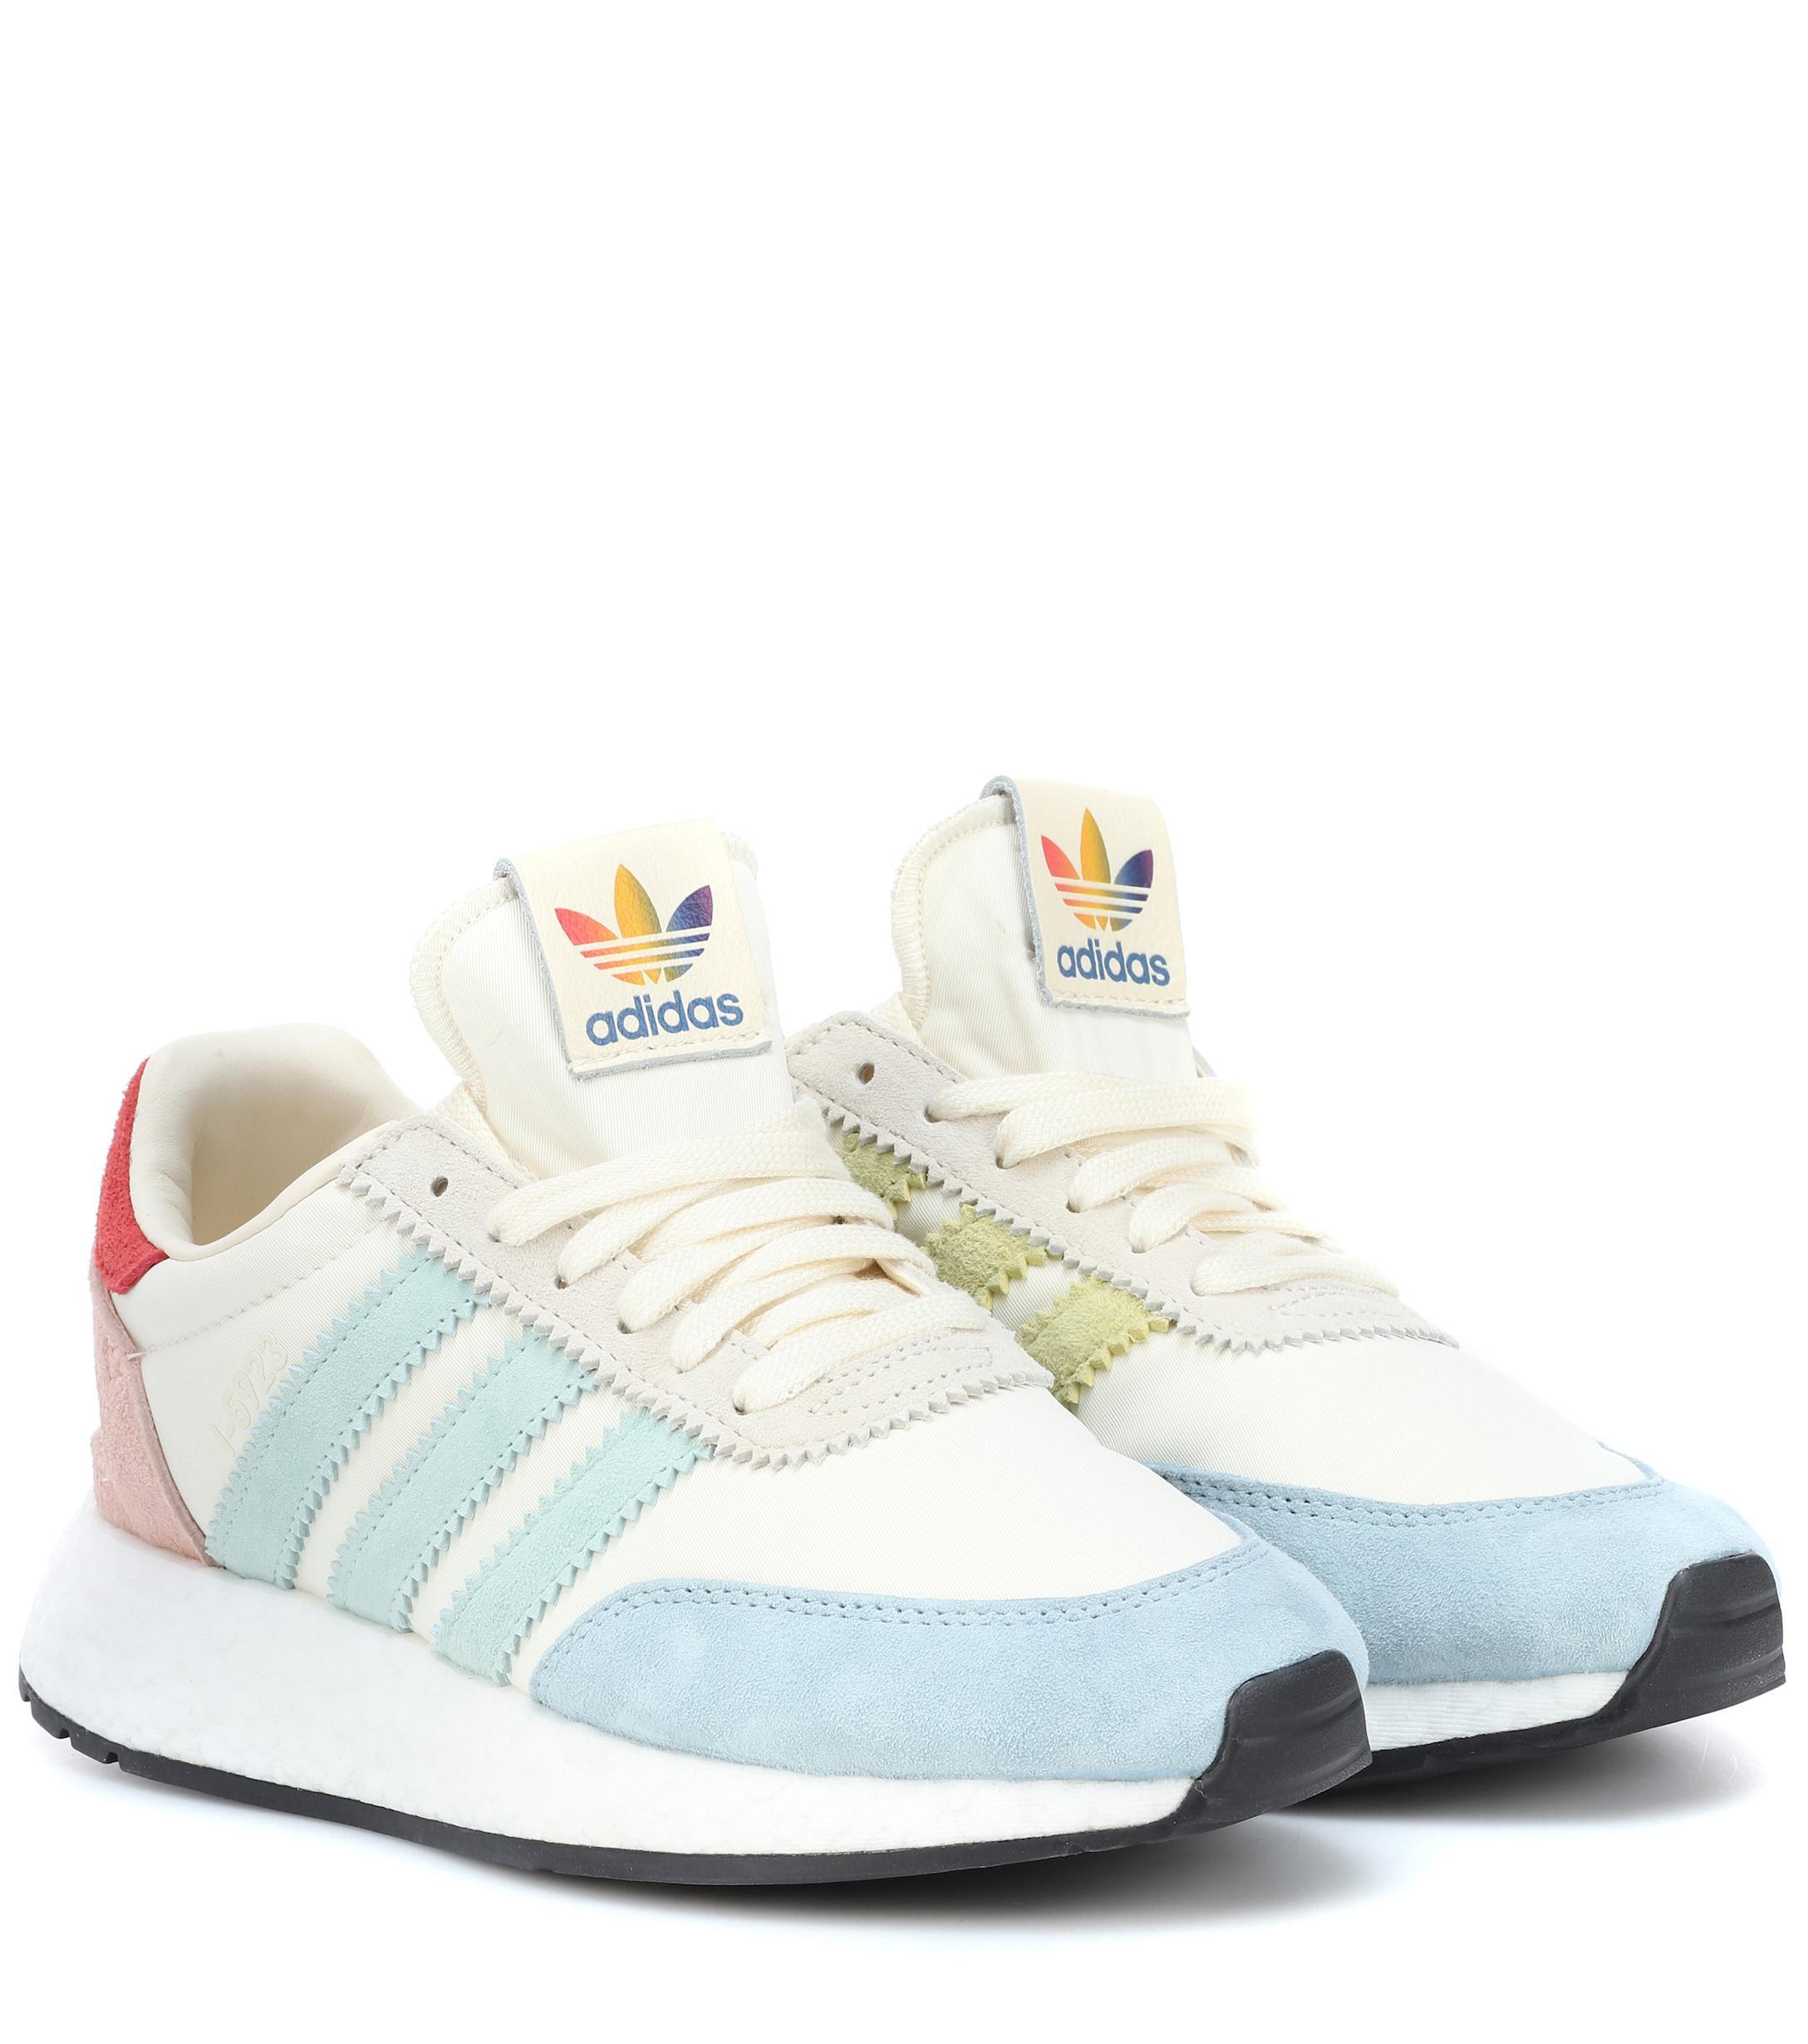 adidas Originals I 5923 Runner Pride Sneakers in WhiteWhite